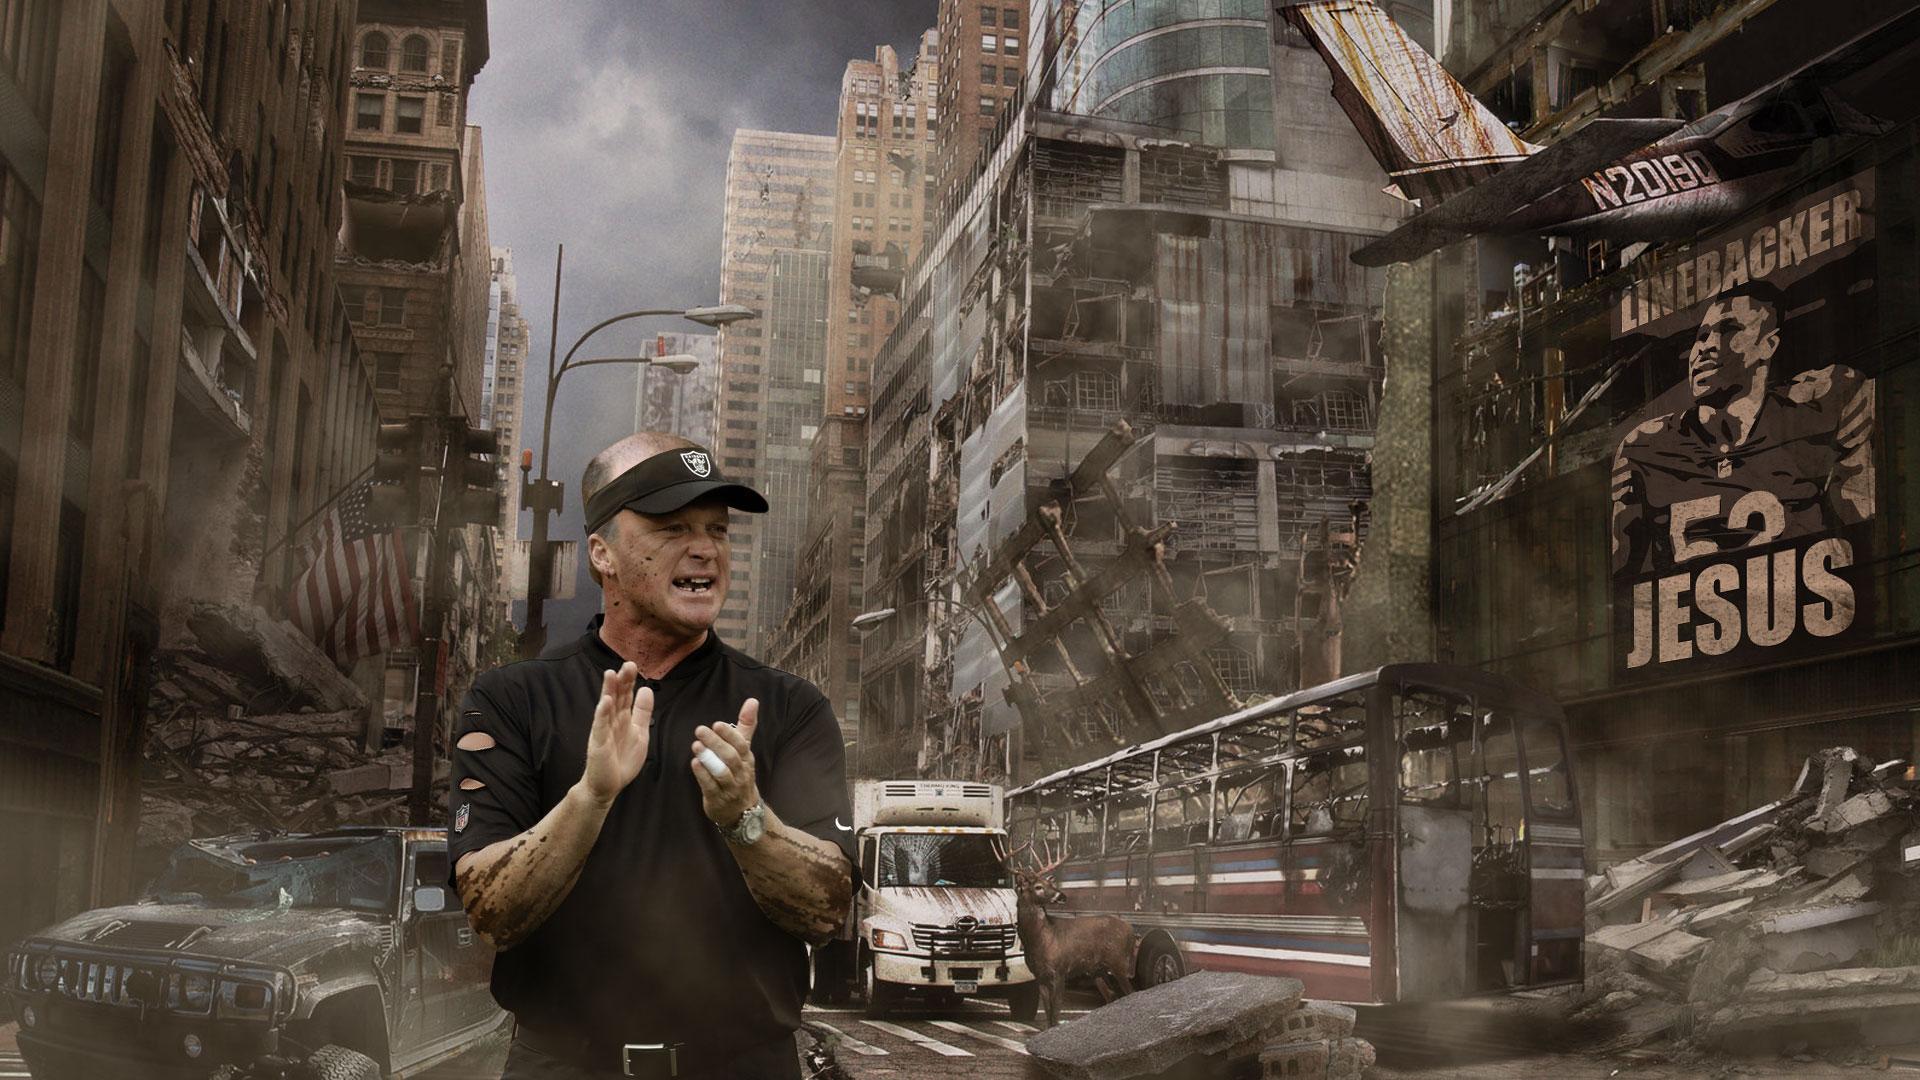 Post-Apocalyptic-Gruden.jpg